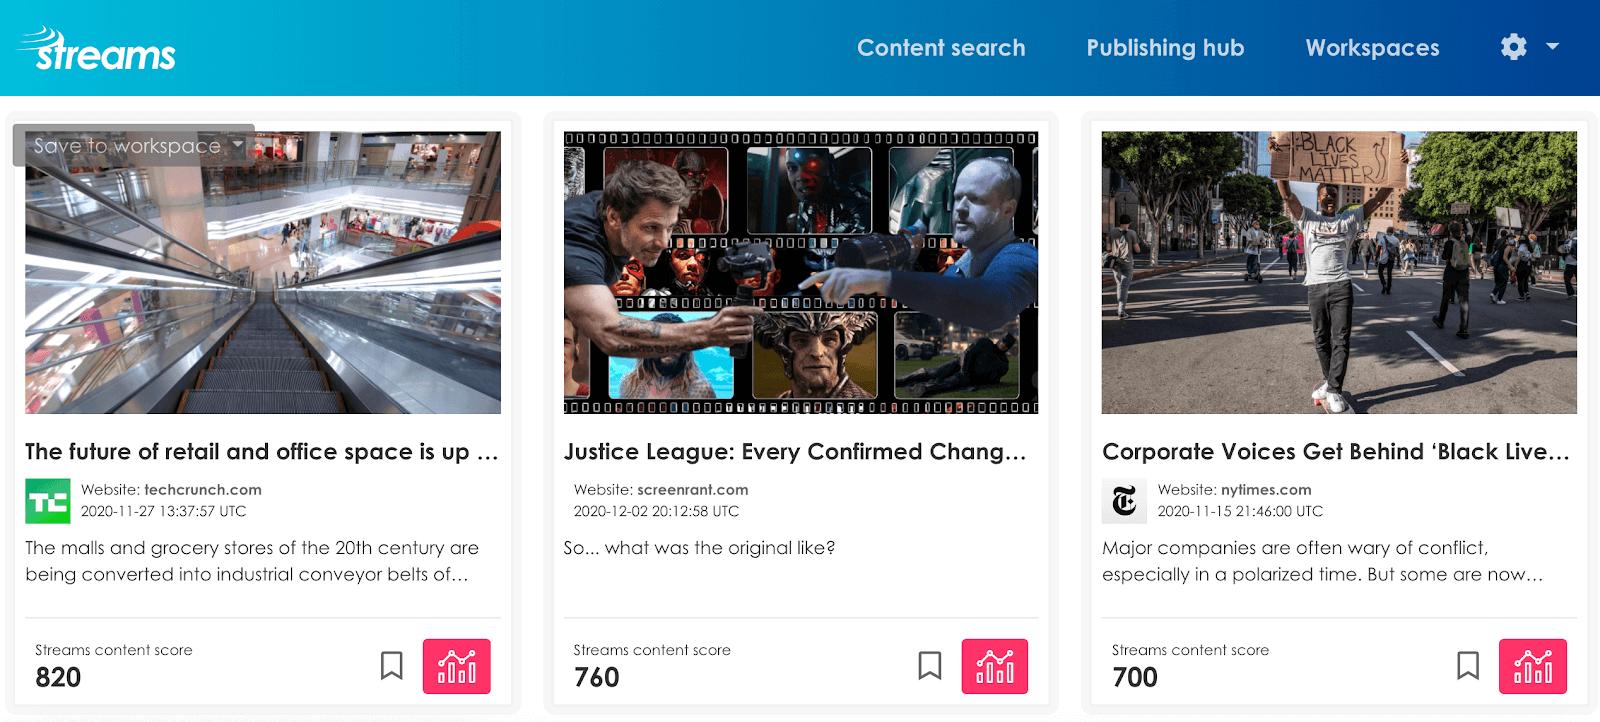 Streams content marketing tool